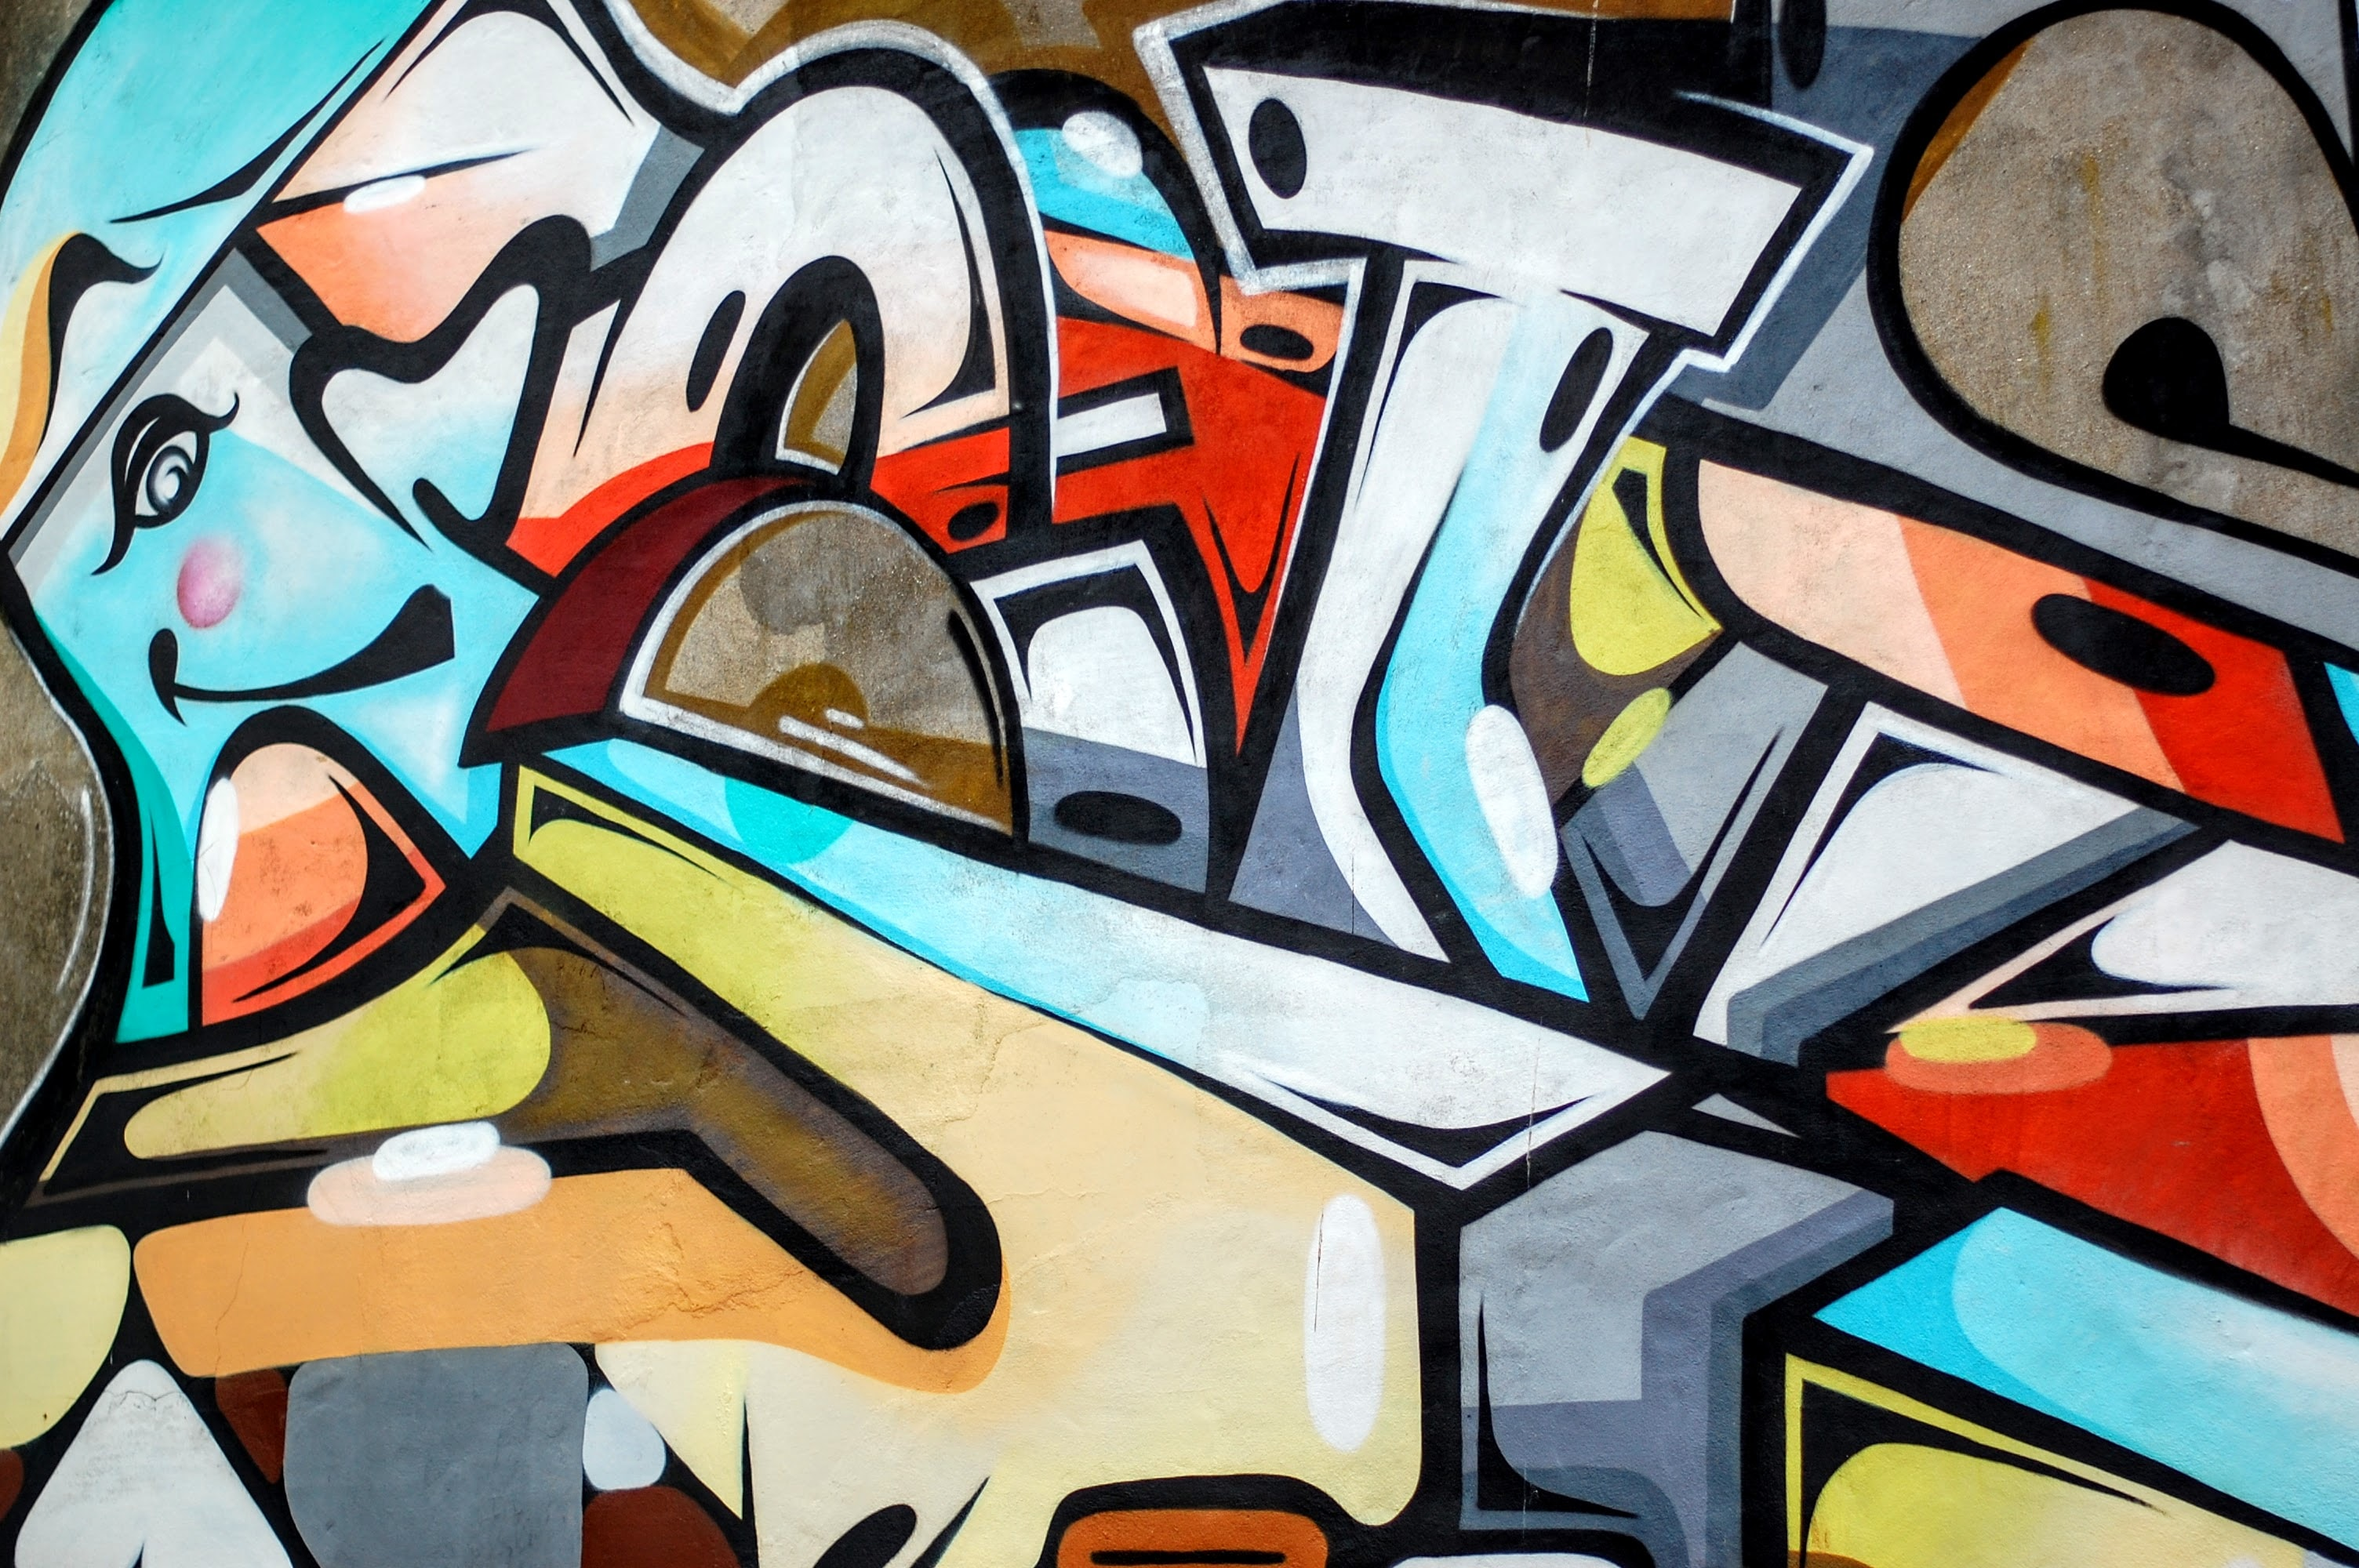 Colorful, wacky, trippy street art graffiti on wall in Bristol